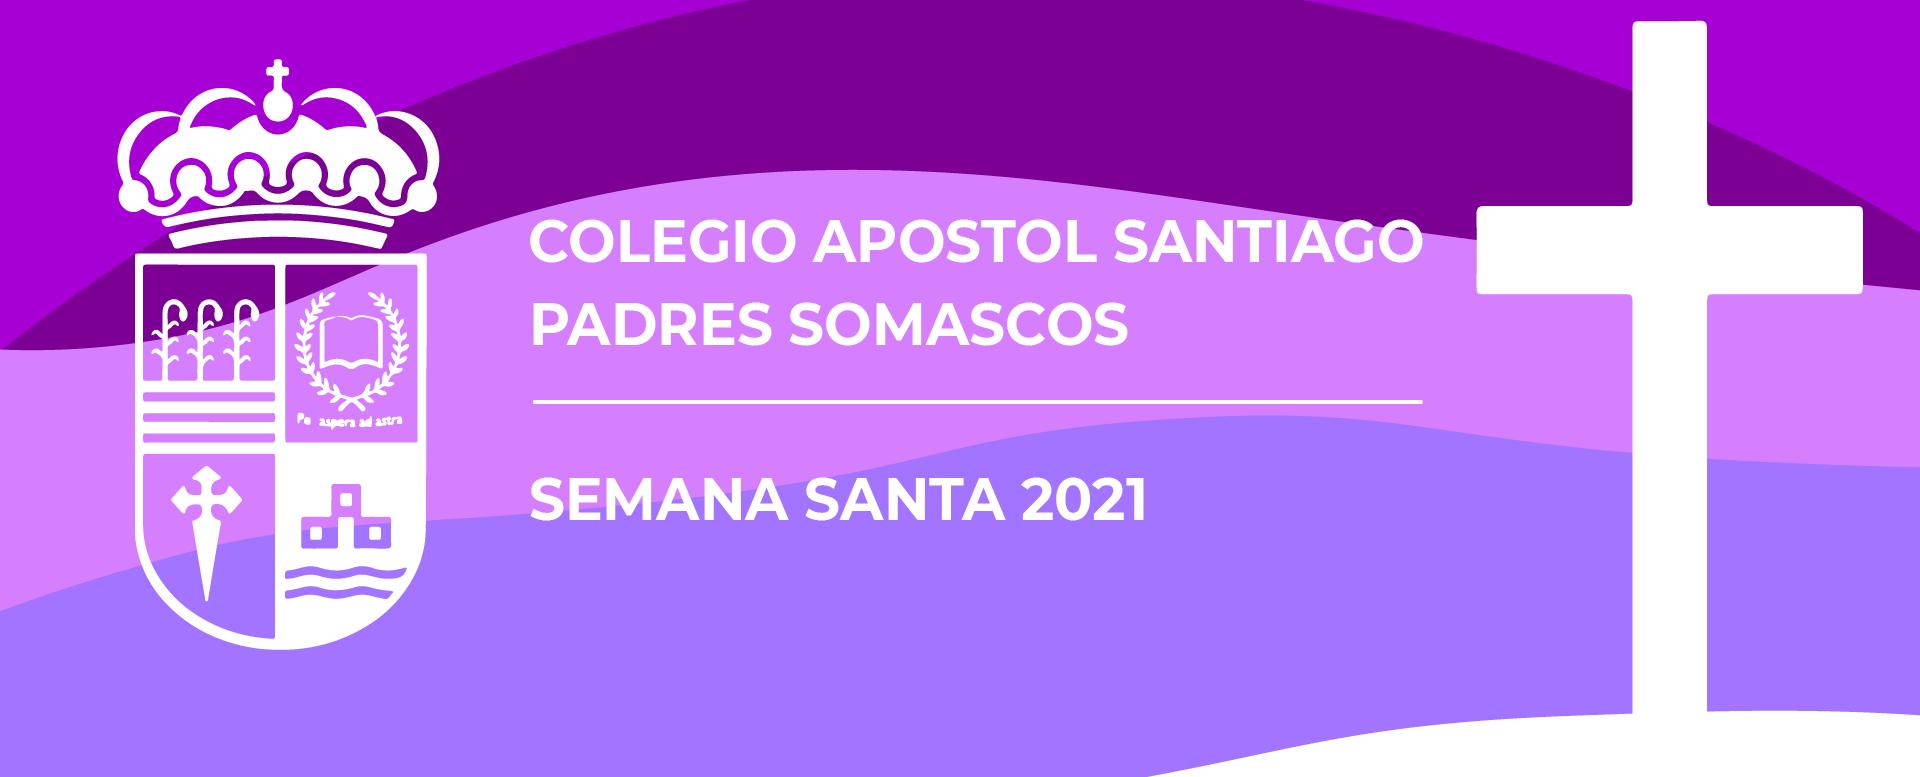 Semana Santa 2021: Aprendamos a servir…